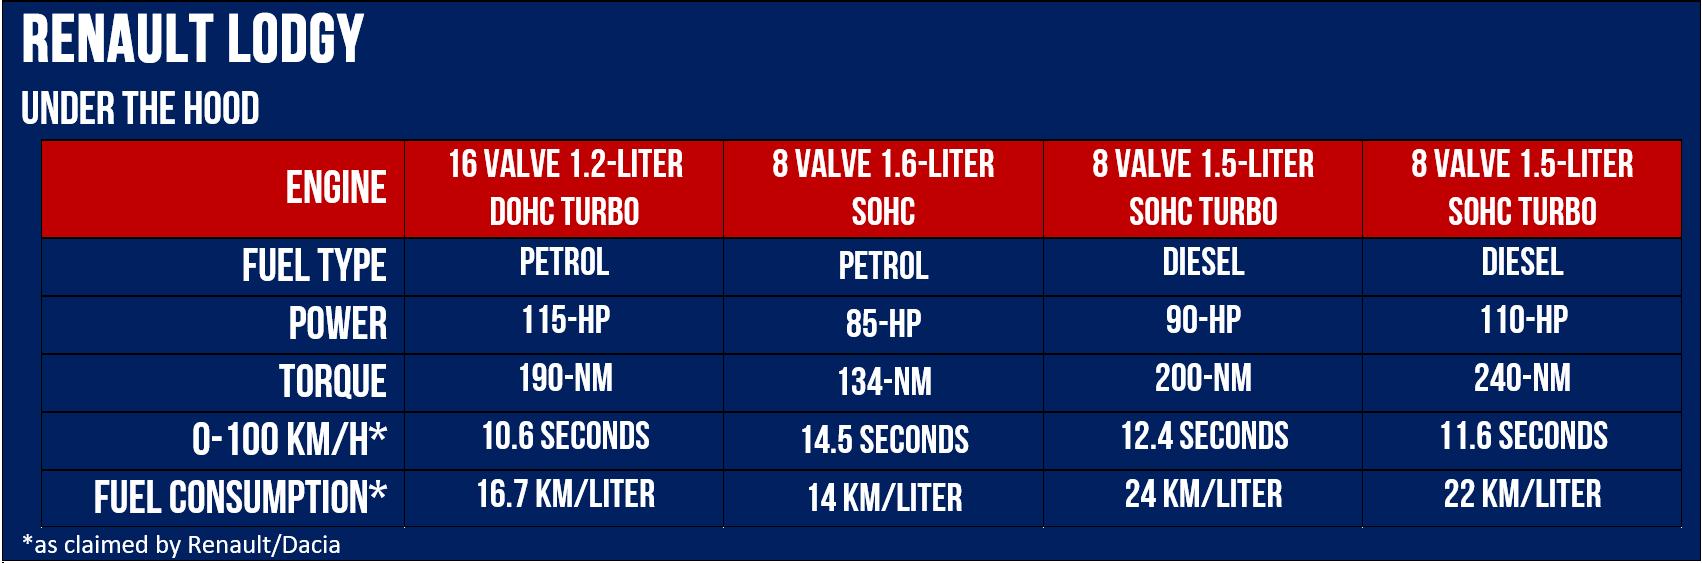 Diesel and Petrol Engines of Renault Lodgy